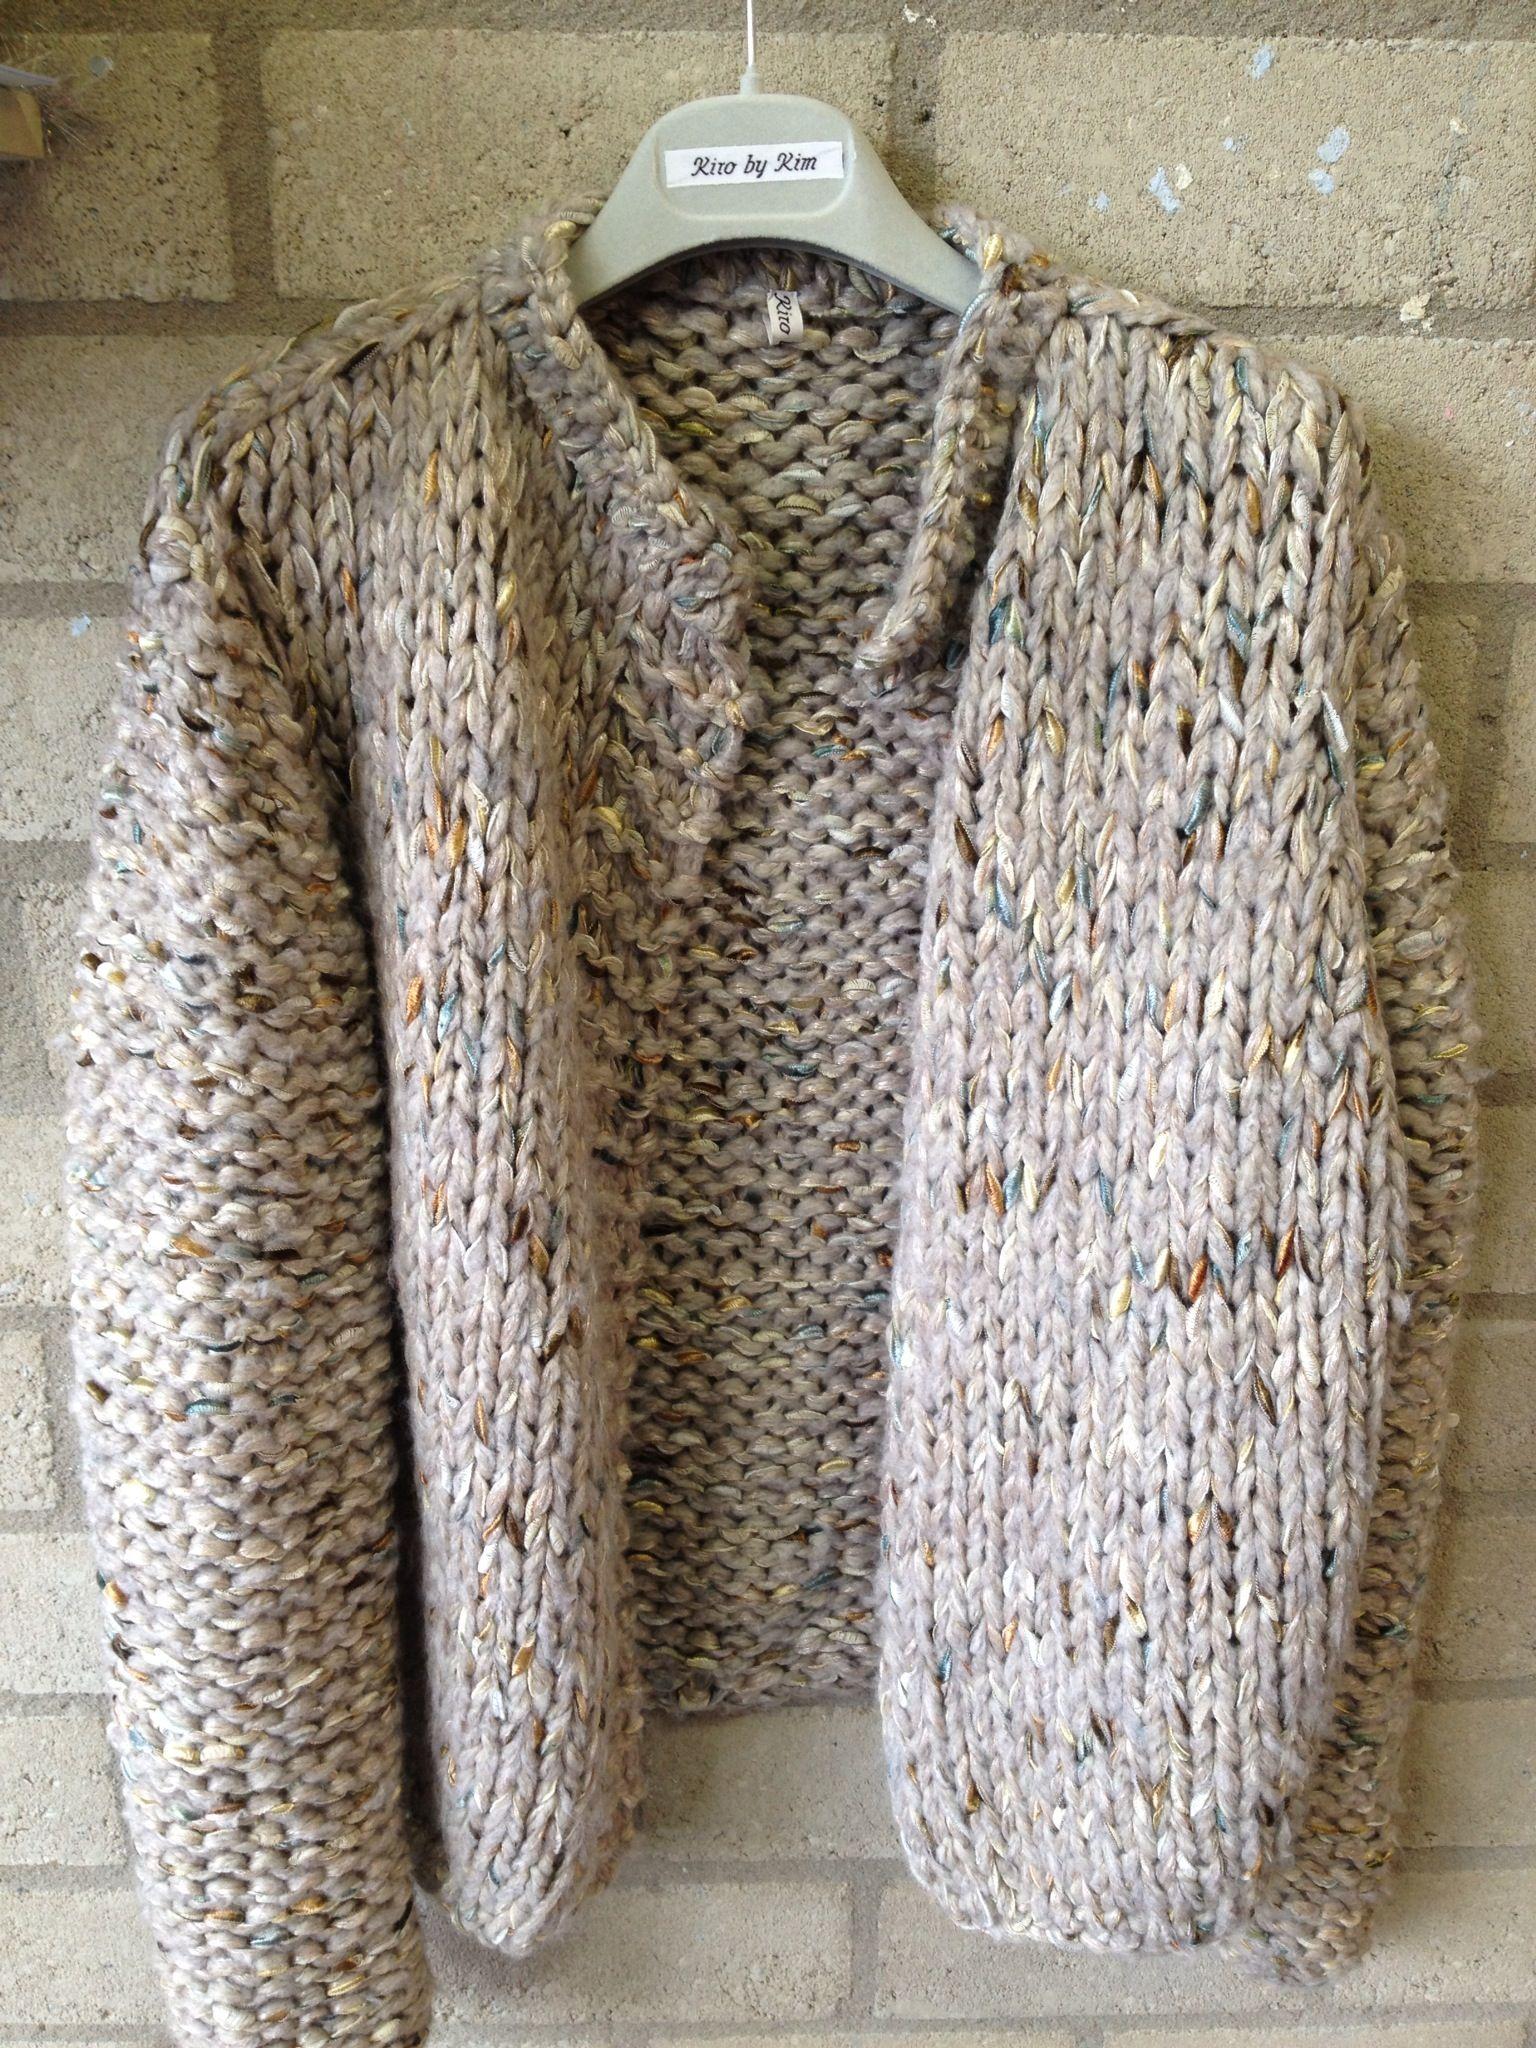 Short handknitted kiro by kim cardigan kiro by kim chunky crochet clothes bankloansurffo Choice Image